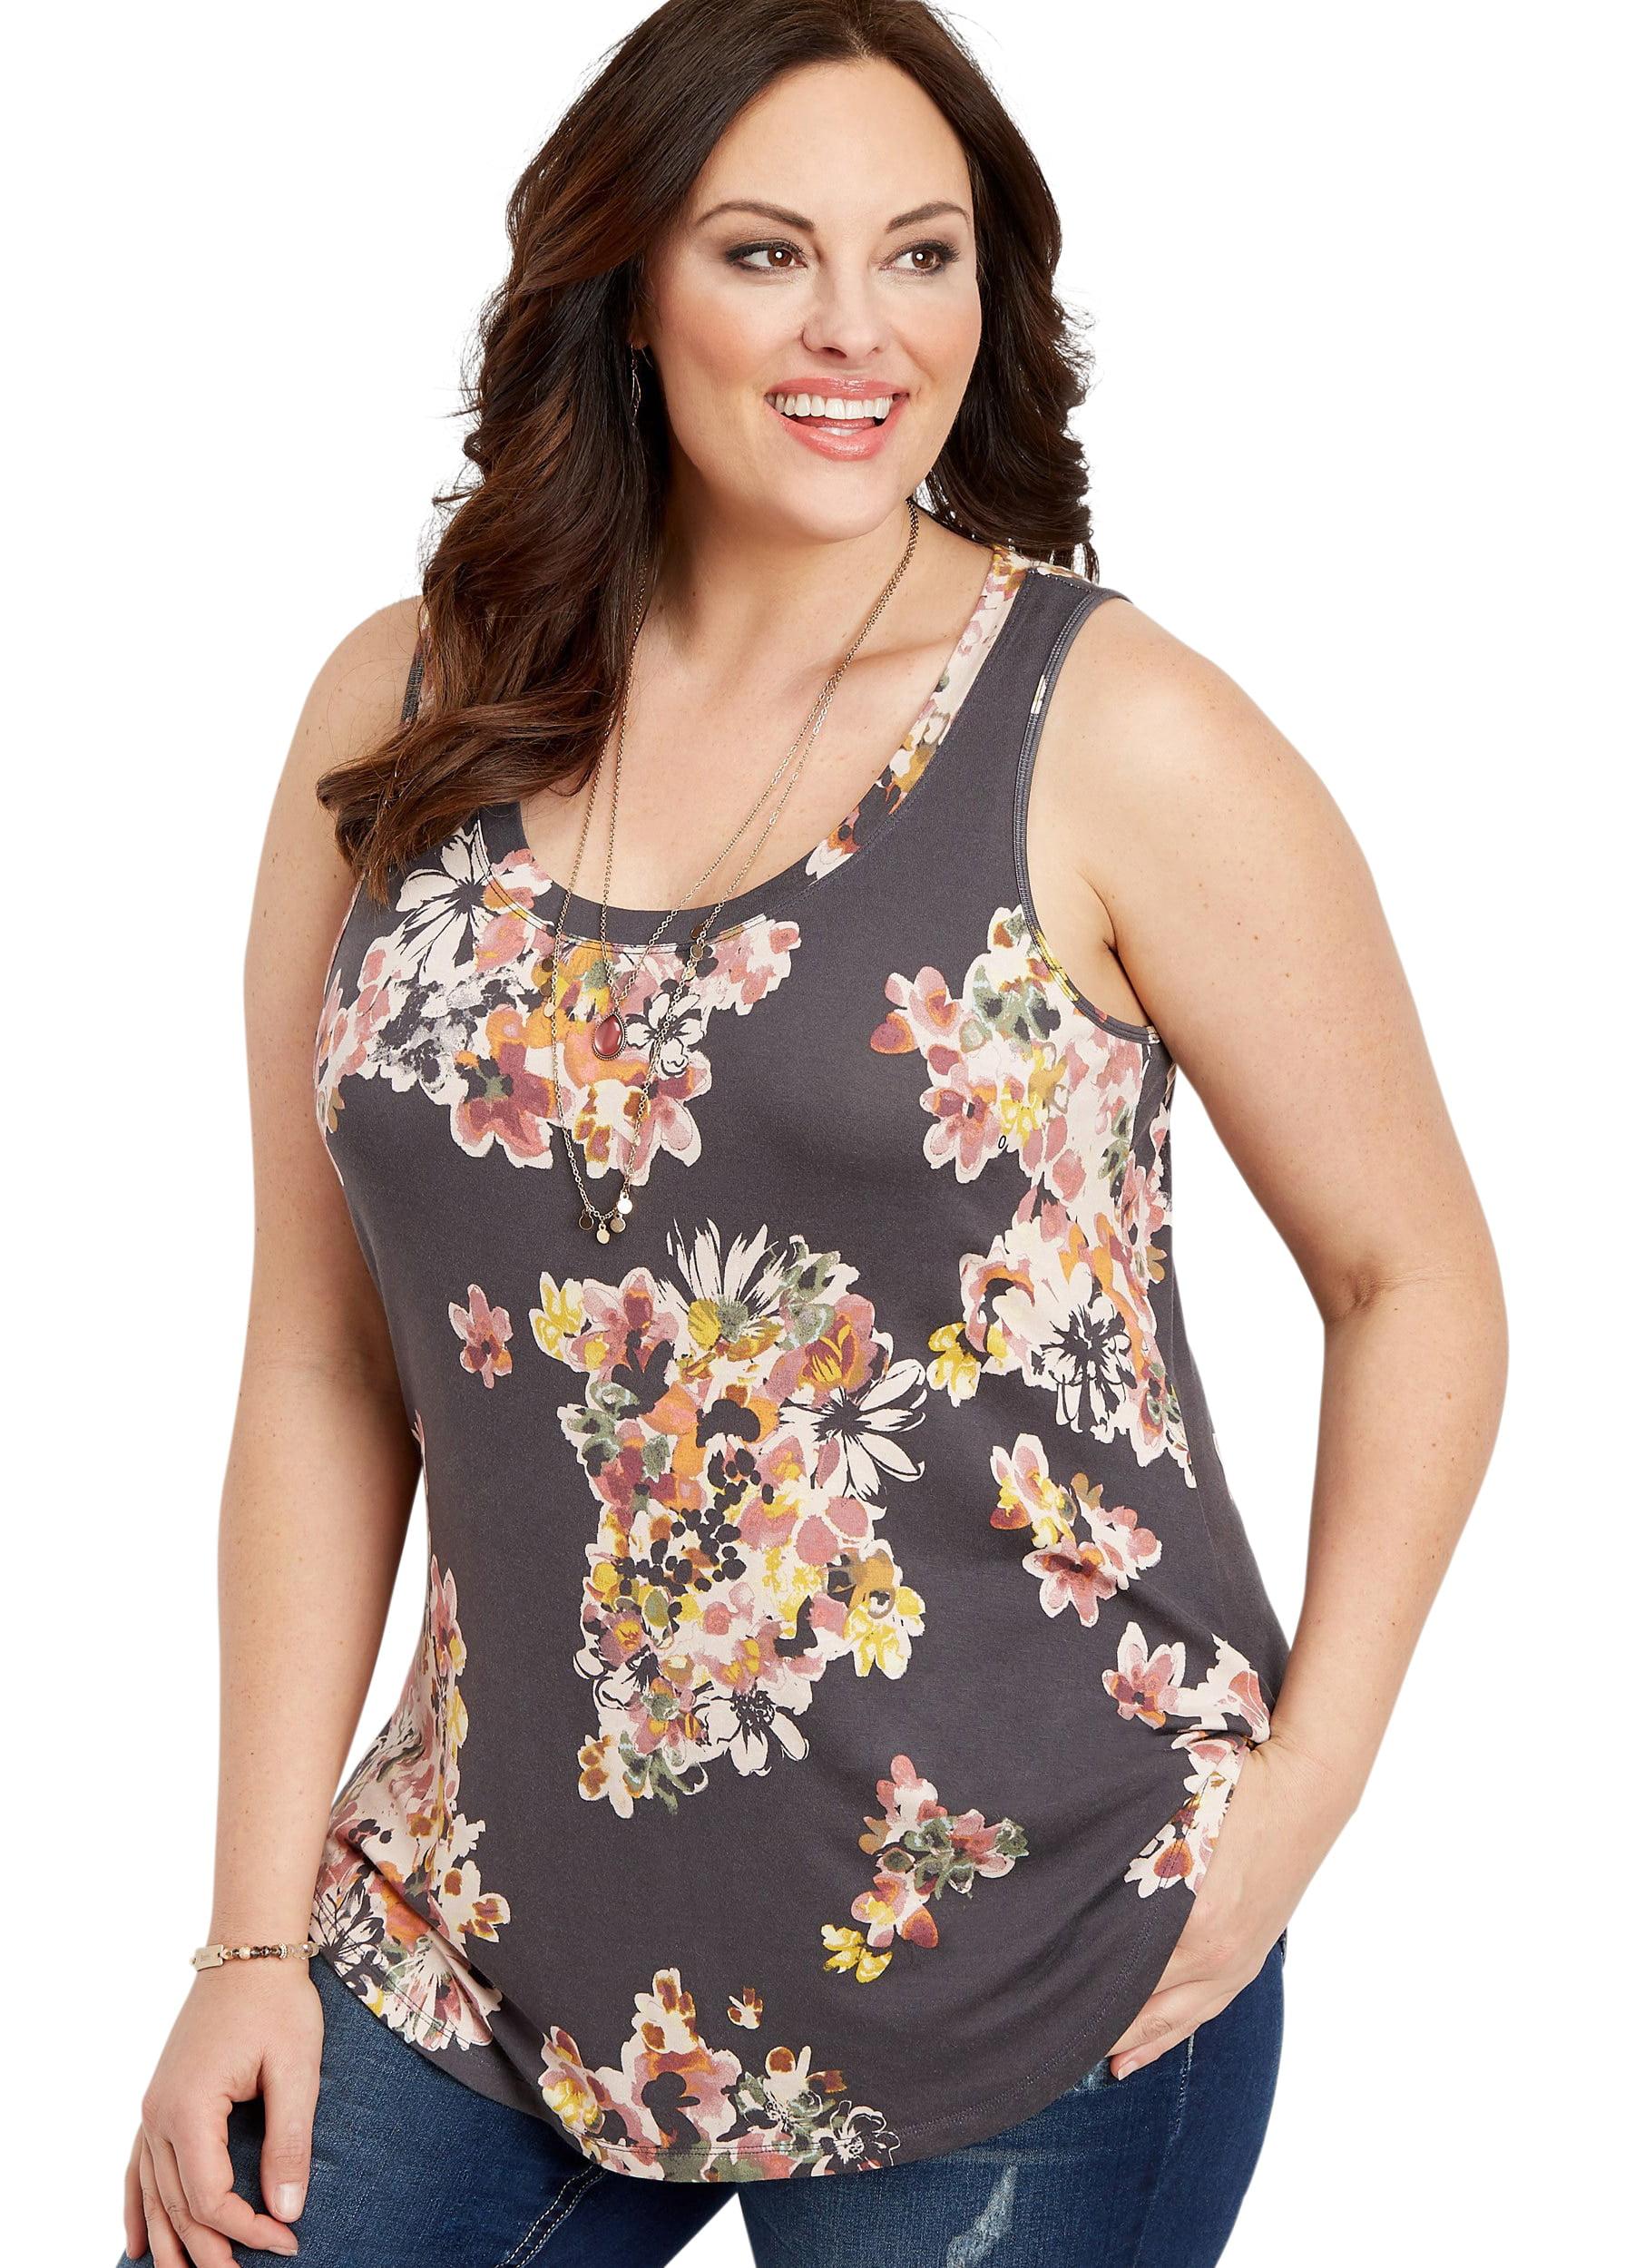 3dc7ffe26b maurices - Plus Size 24/7 Floral Scoop Neck Tank - Walmart.com